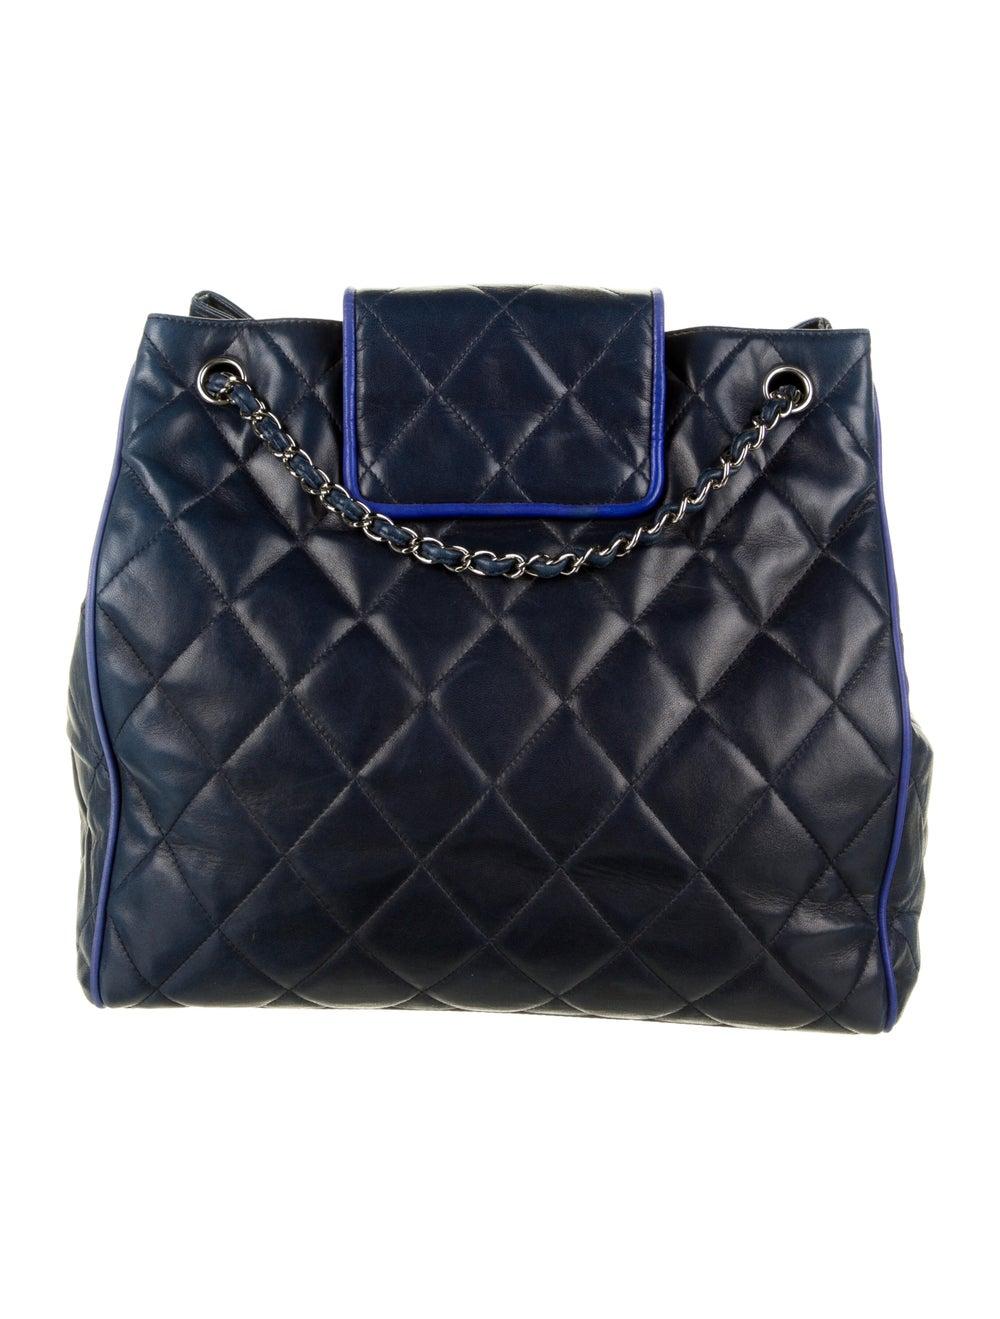 Chanel Hamptons CC Accordion Flap Bag Blue - image 4